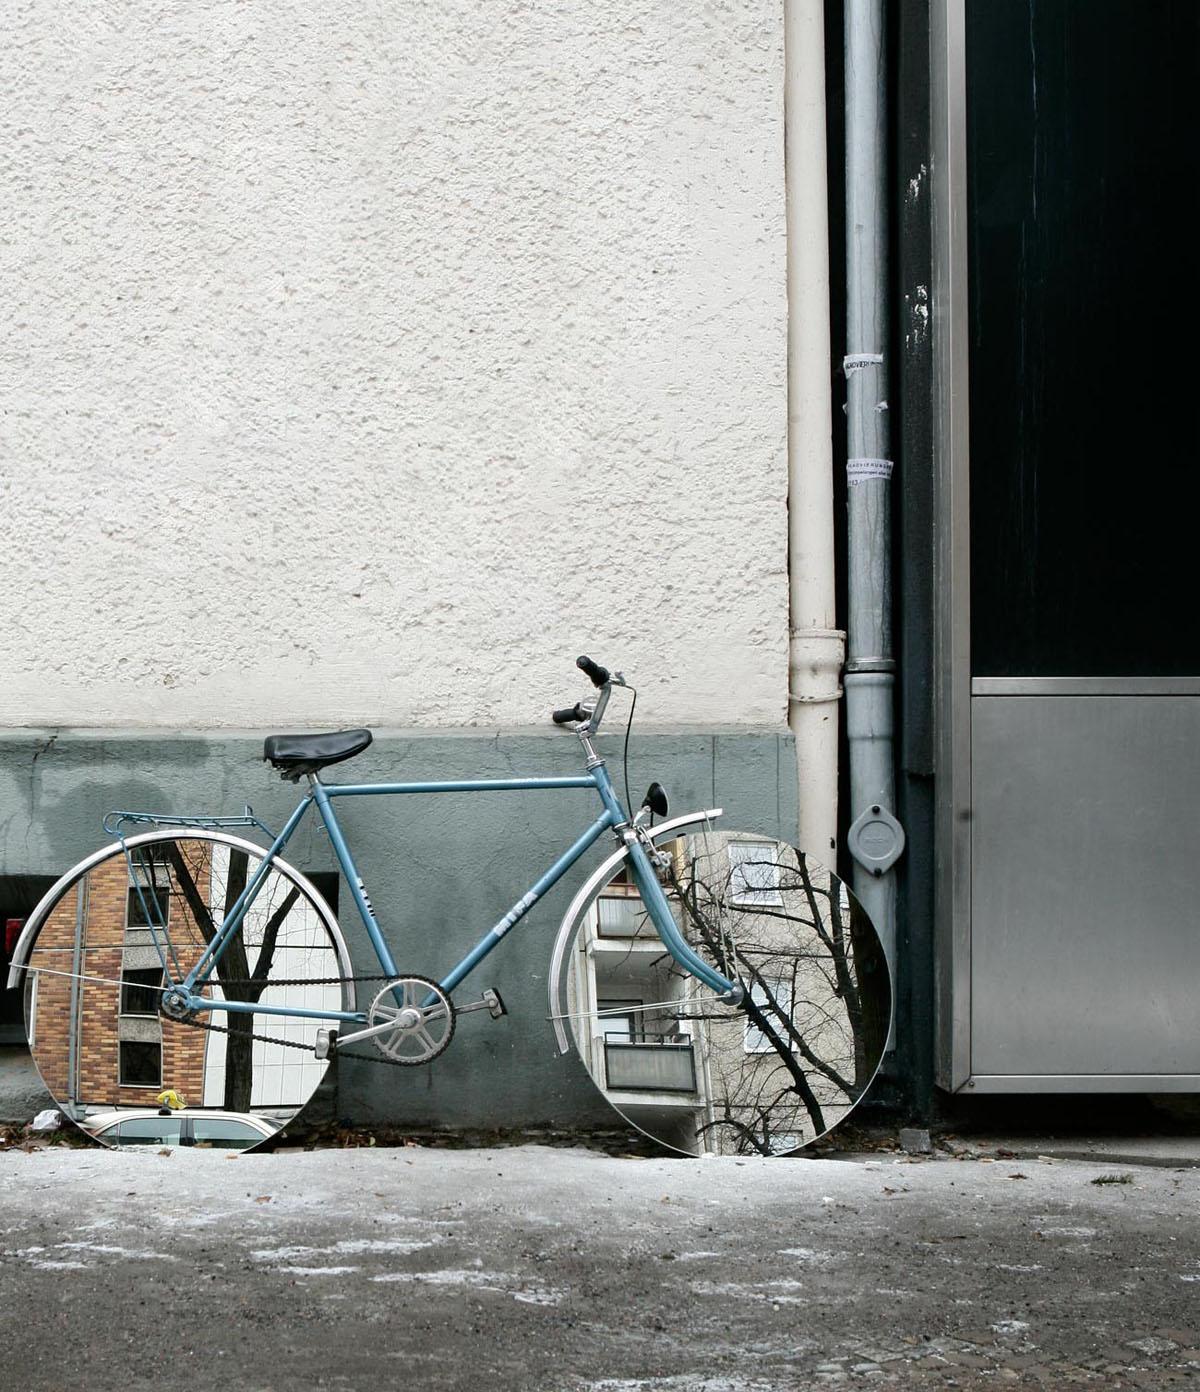 Stahlrahmen als Kunst-Rahmen | Stahlrahmen-Bikes